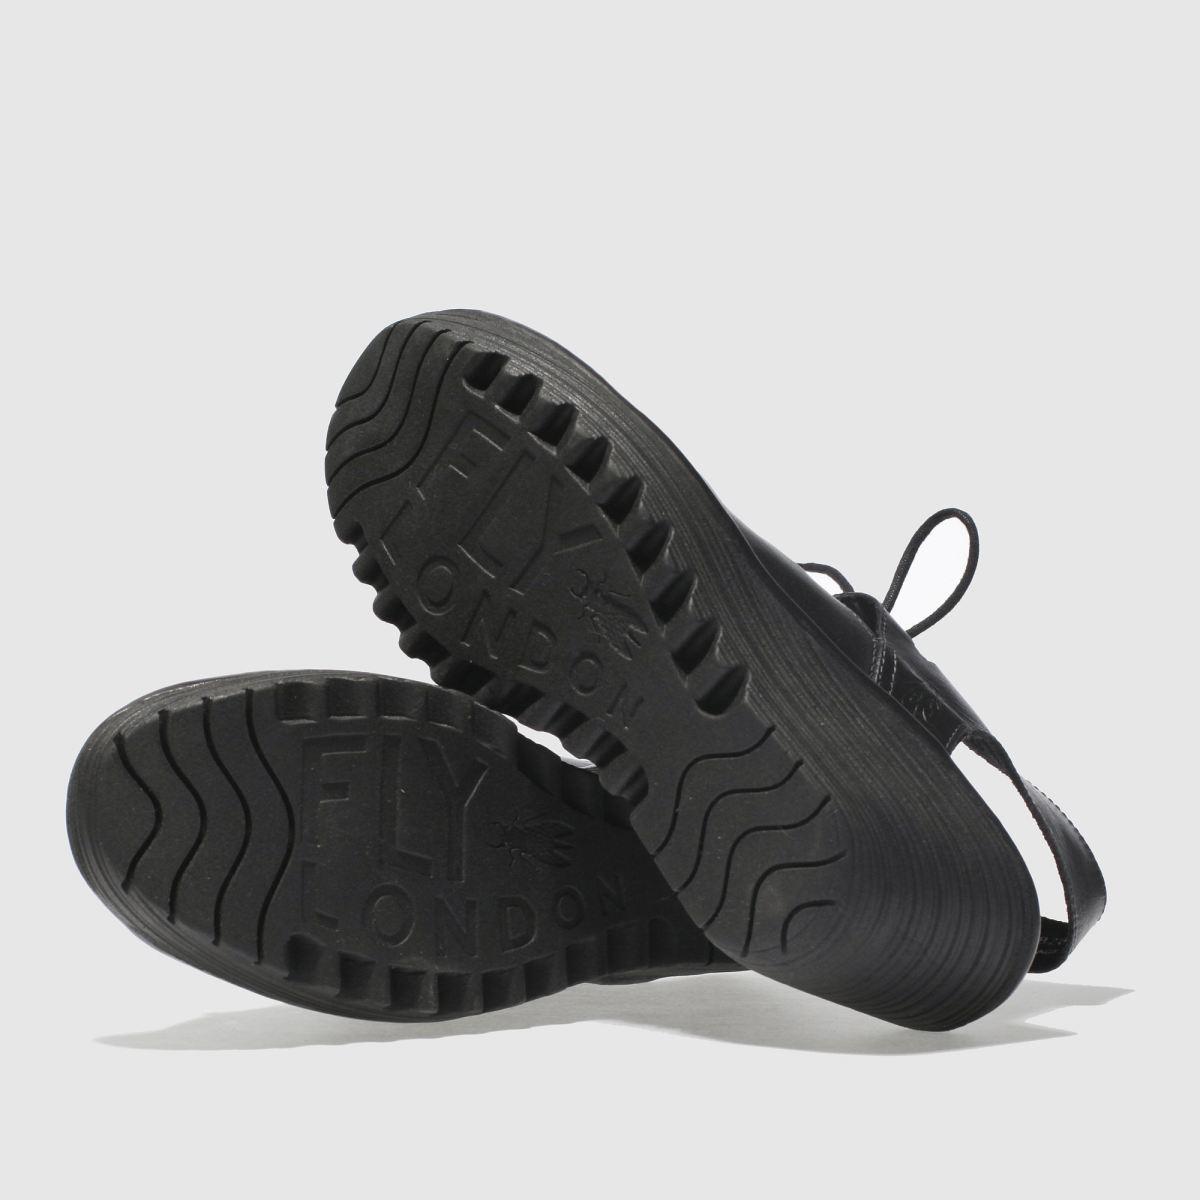 Damen Schwarz fly london schuh Fly Yote Sandalen | schuh london Gute Qualität beliebte Schuhe 7a7632